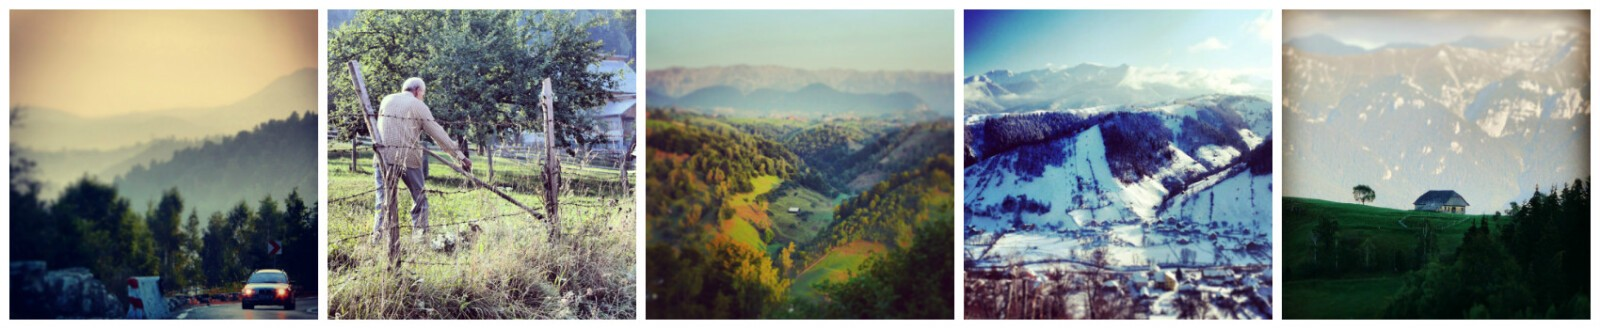 Pure Romania, Travel to Romania, traditional Romania